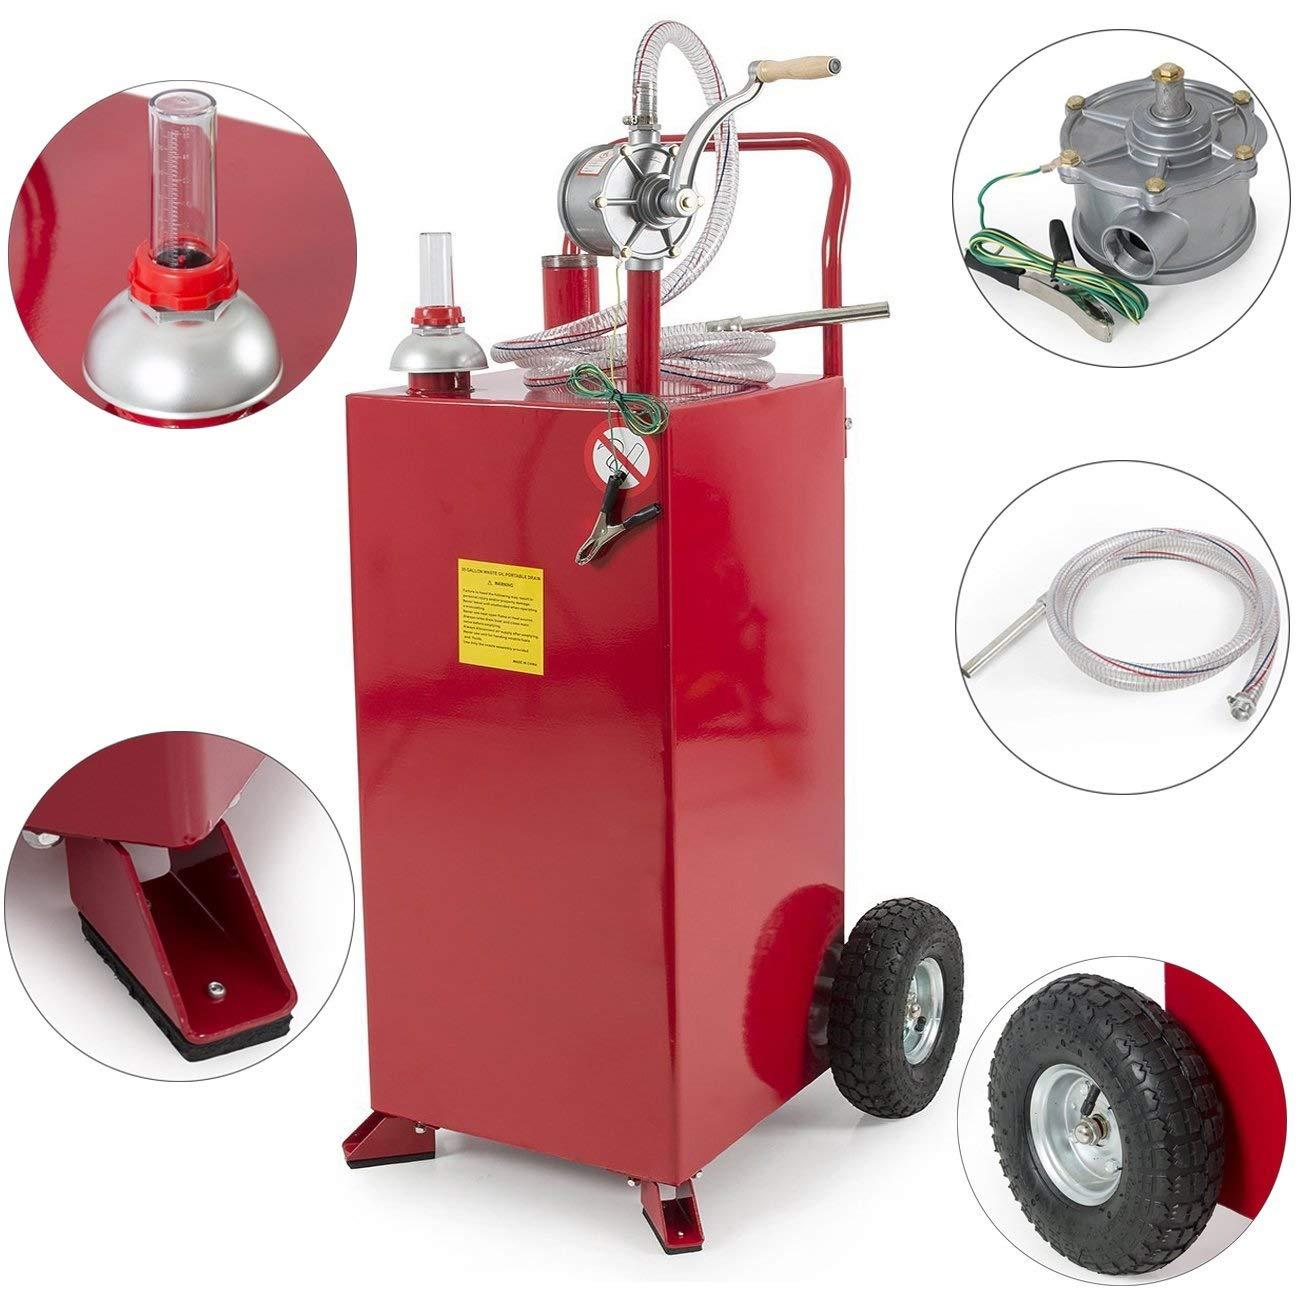 Stark 30 Gallon Gas Caddy Tank Gasoline Fluid Diesel Fuel Transfer Storage Dispenser with Pump, Red by Stark USA